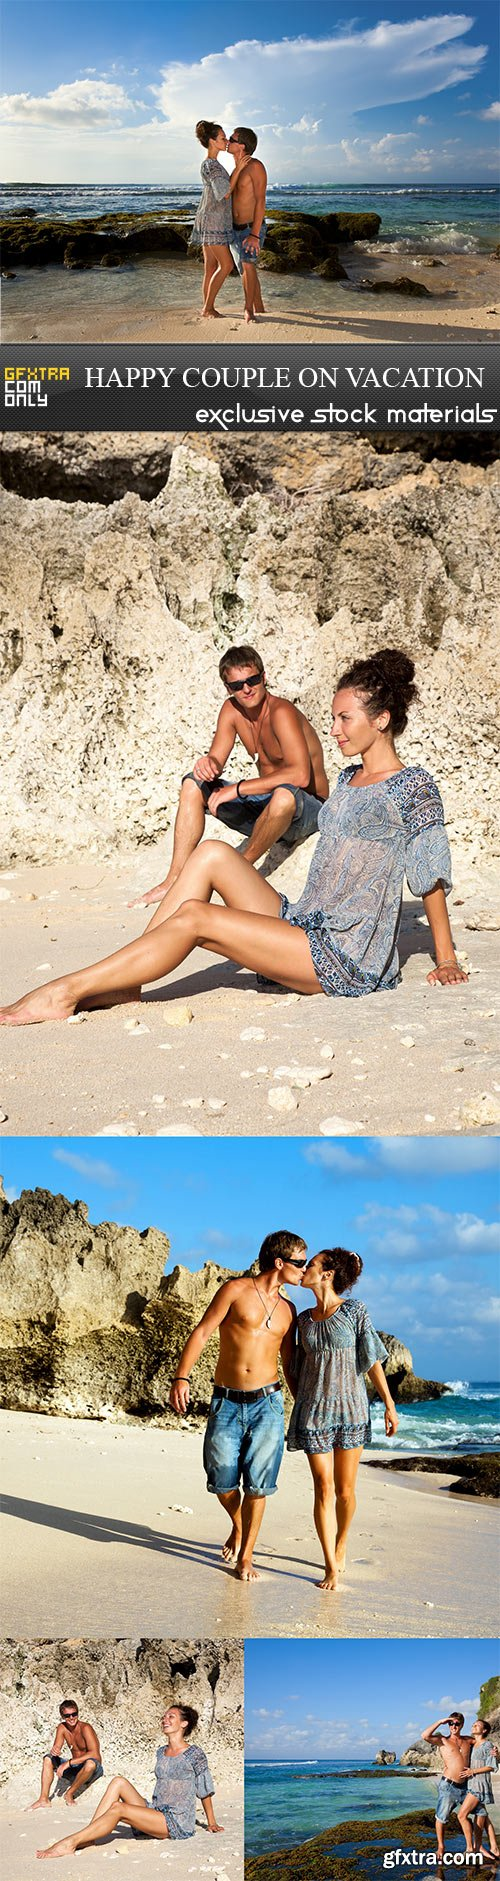 Happy Couple on Vacation - 5 UHQJPEG